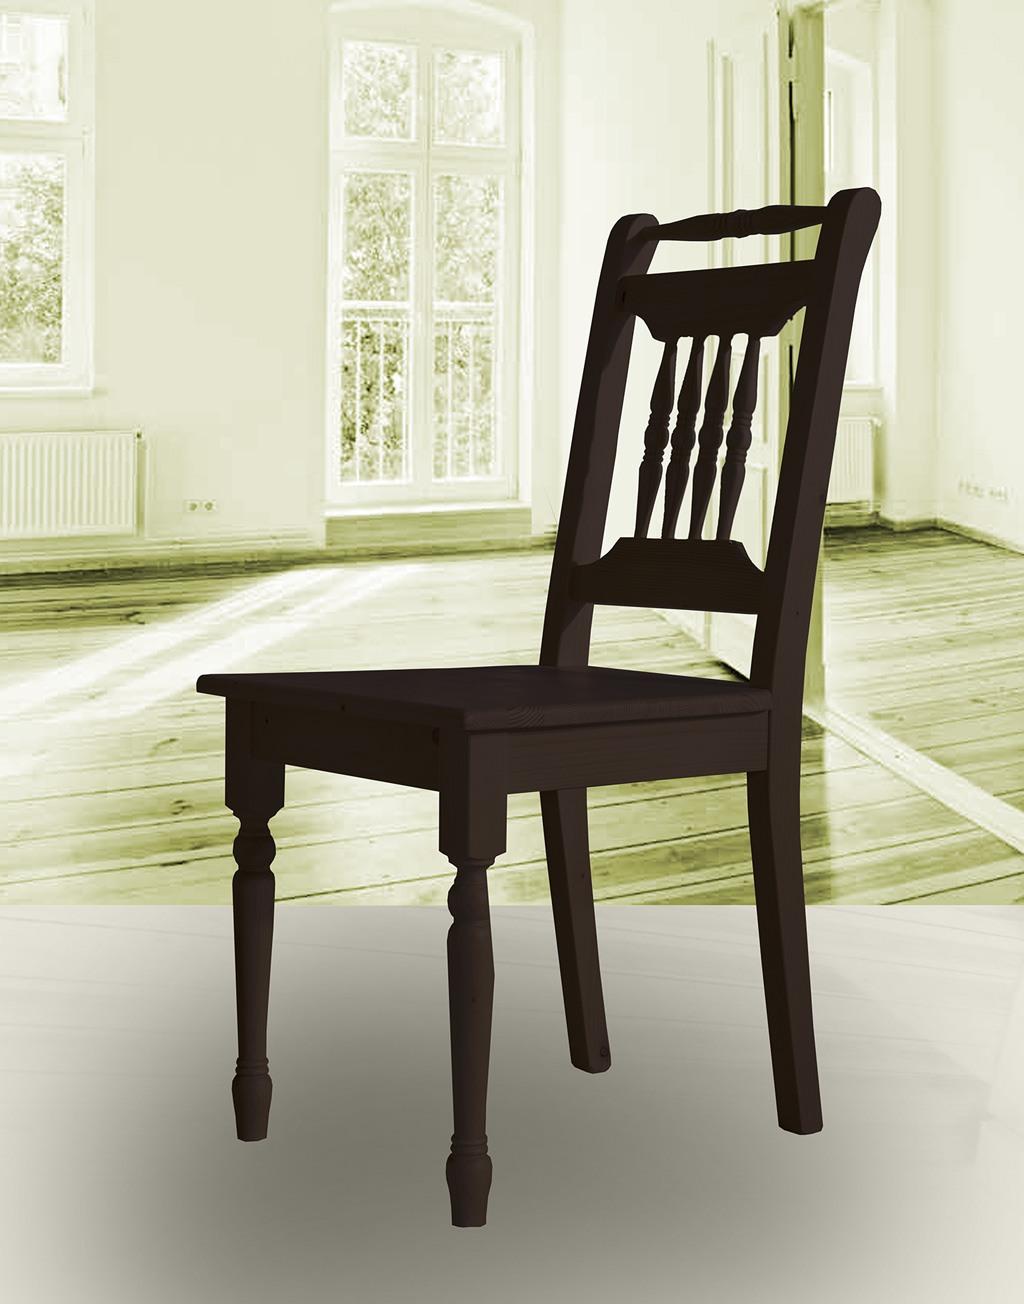 Landhaus Stuhl massiv Fichte Alina wenge lackiert.